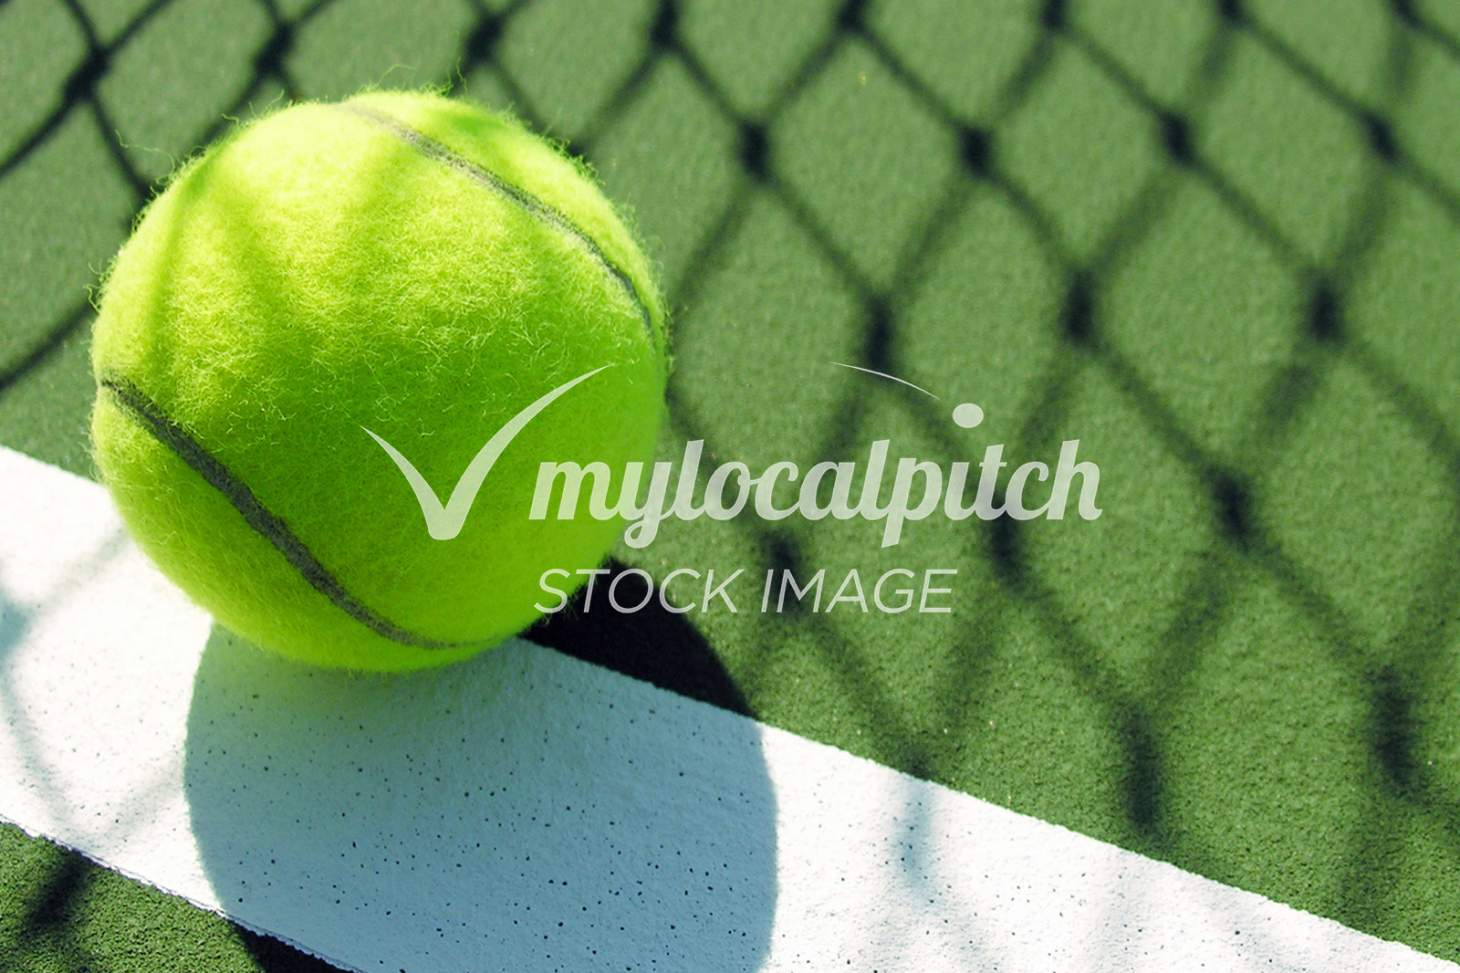 Moormead Recreation Ground Outdoor | Hard (macadam) tennis court